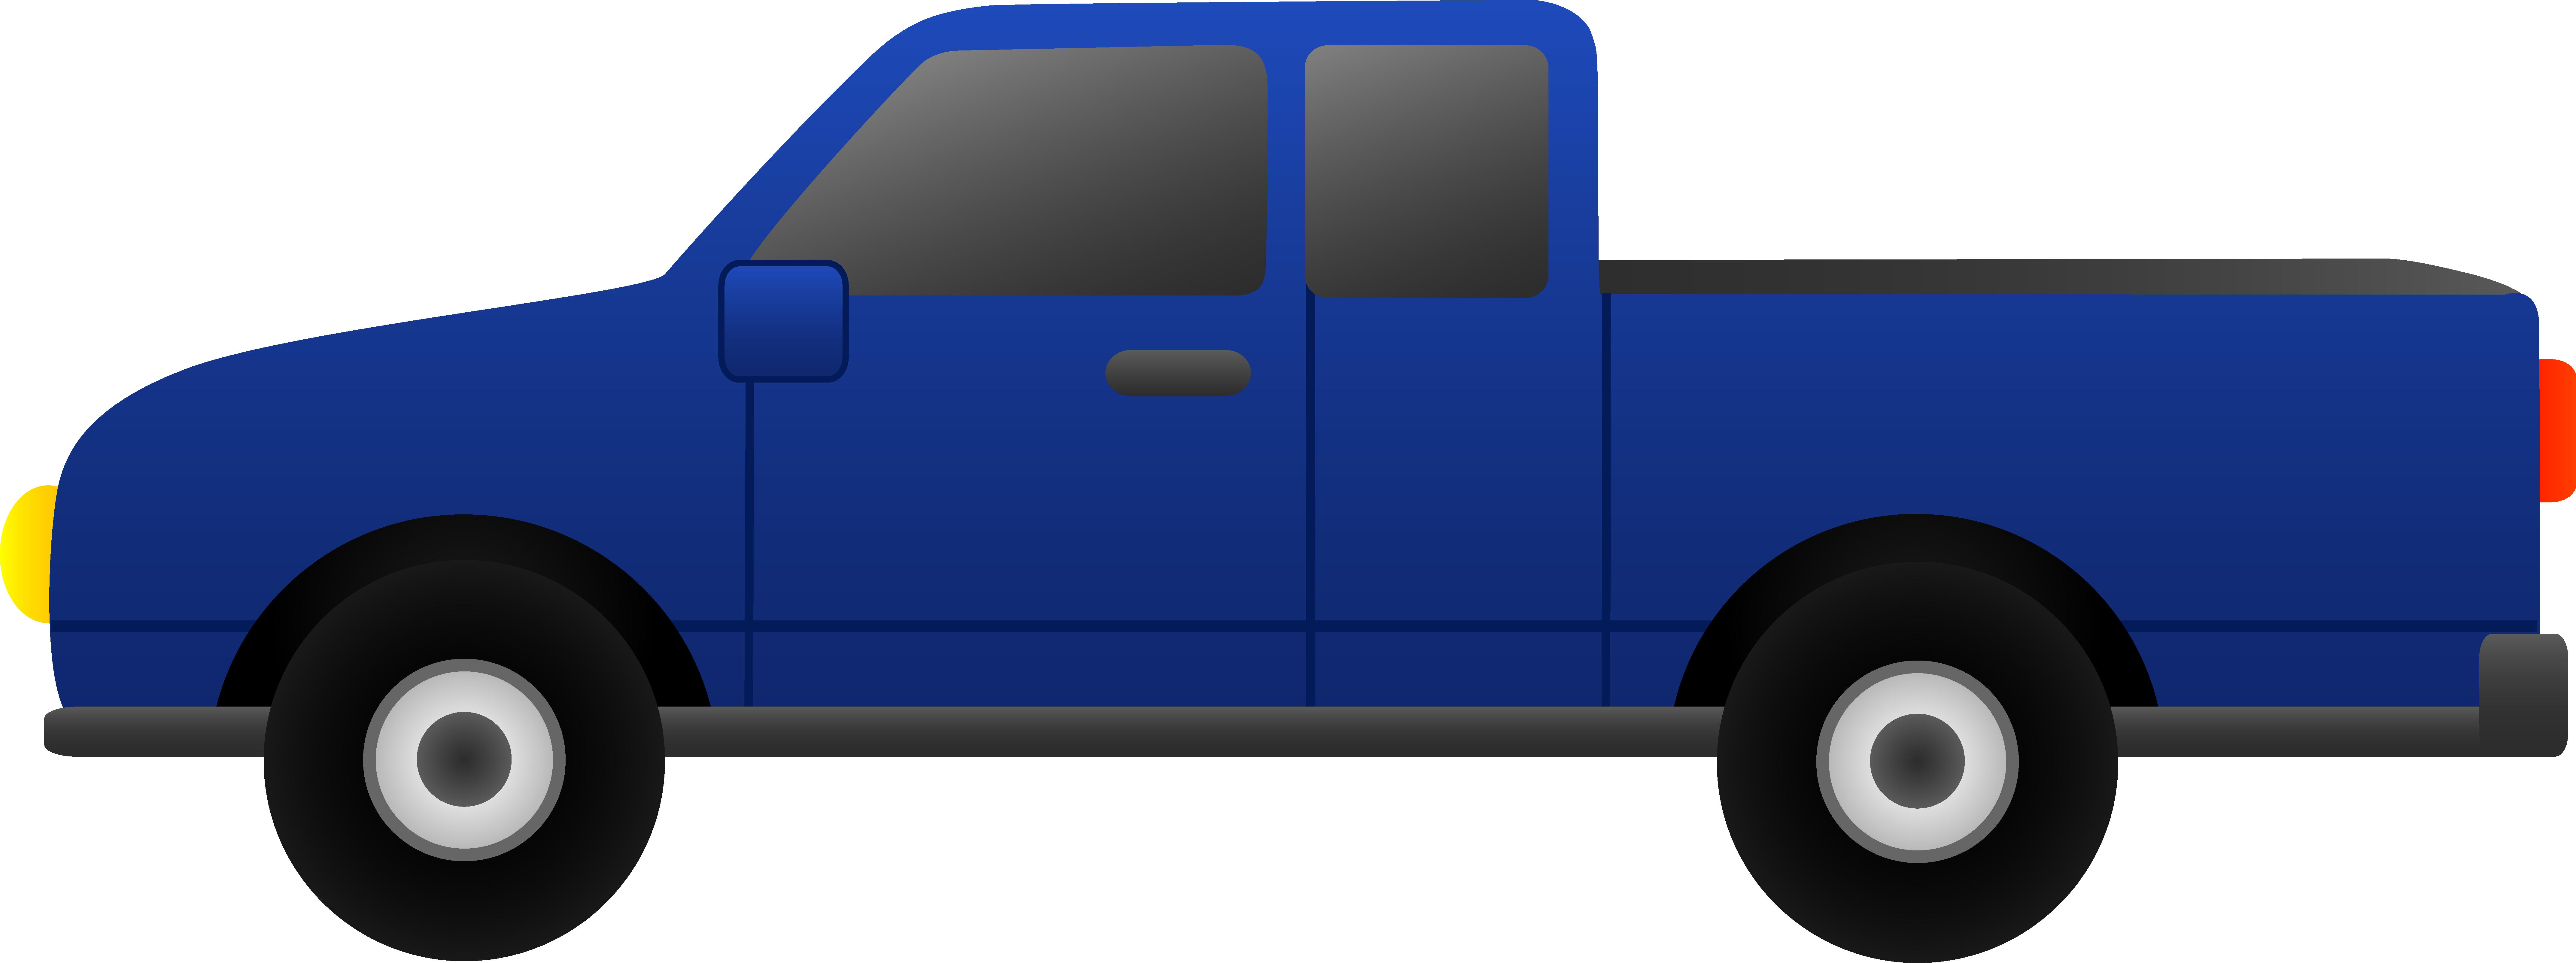 8576x3207 Chevy Pickup Truck Clipart Clipart Panda